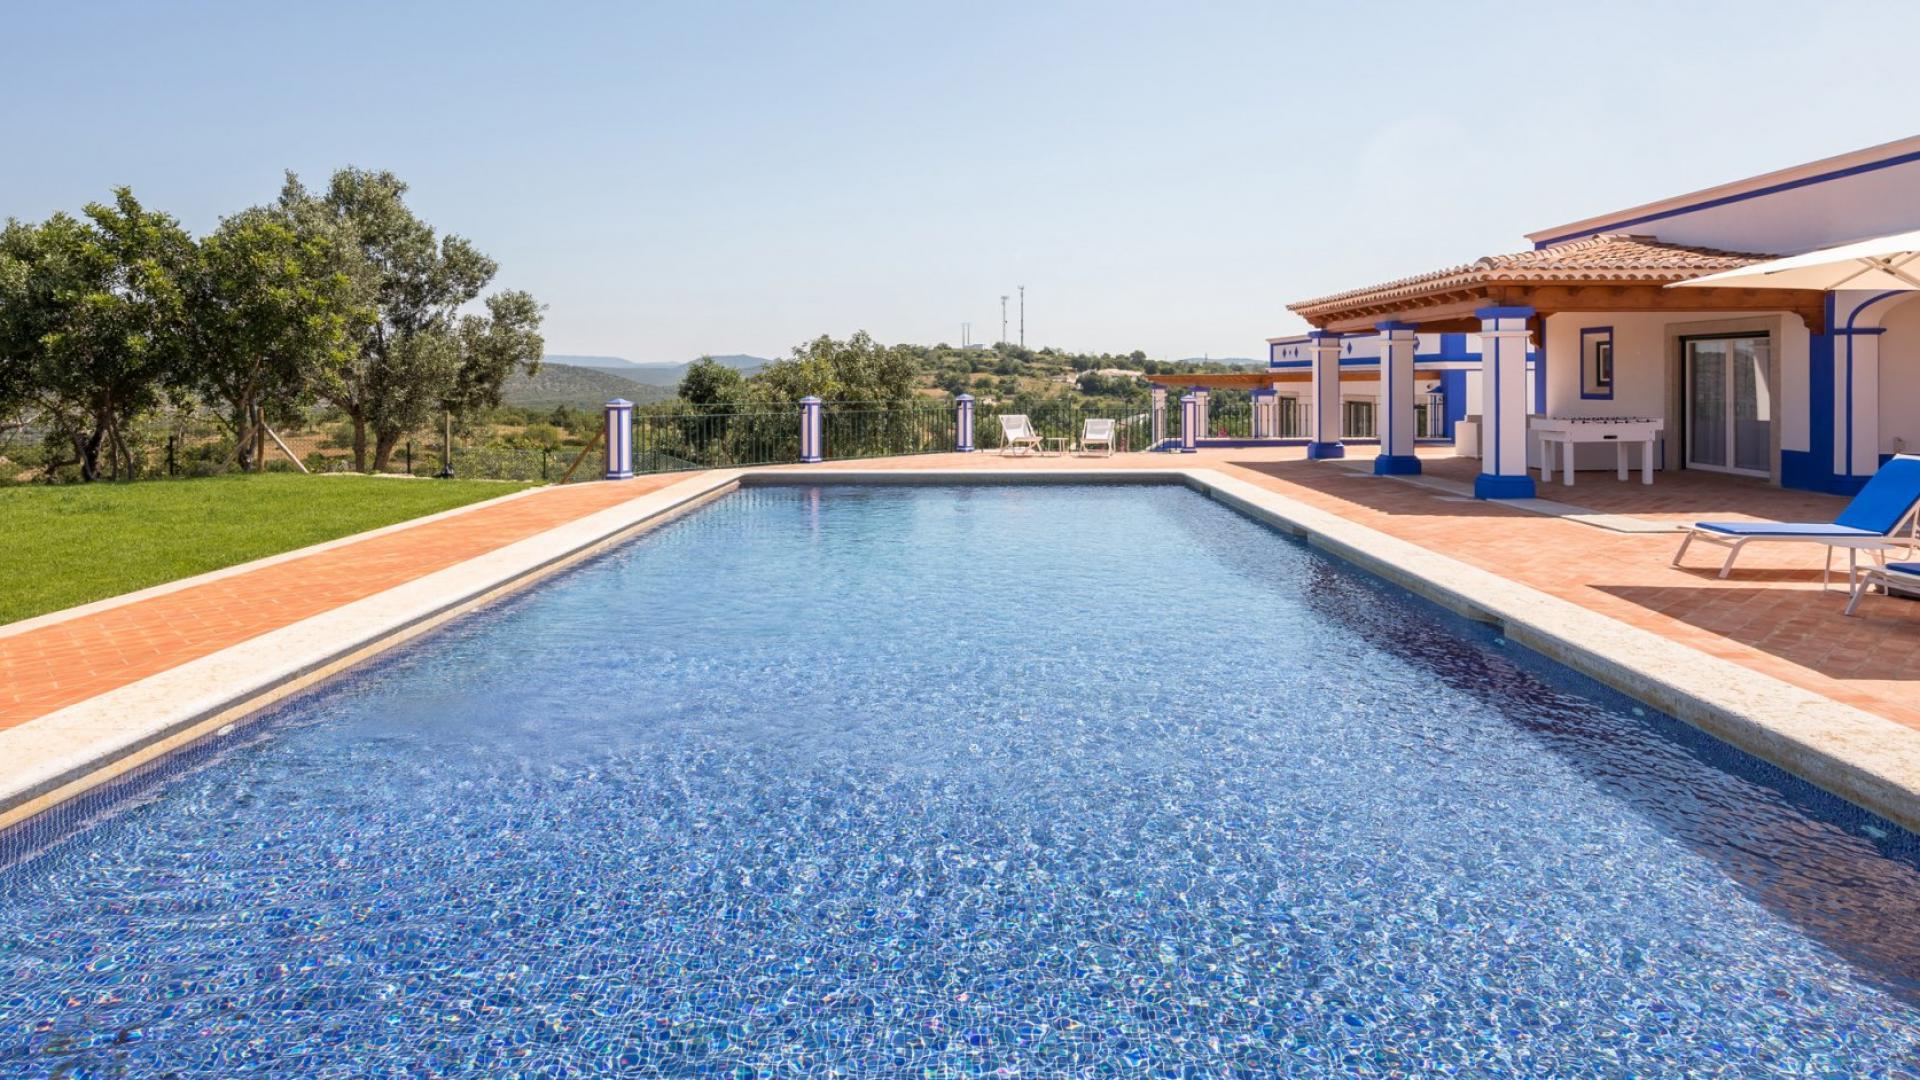 Villa Blue Sky  - Boliqueime, Algarve - _55A7593-HDR.jpg